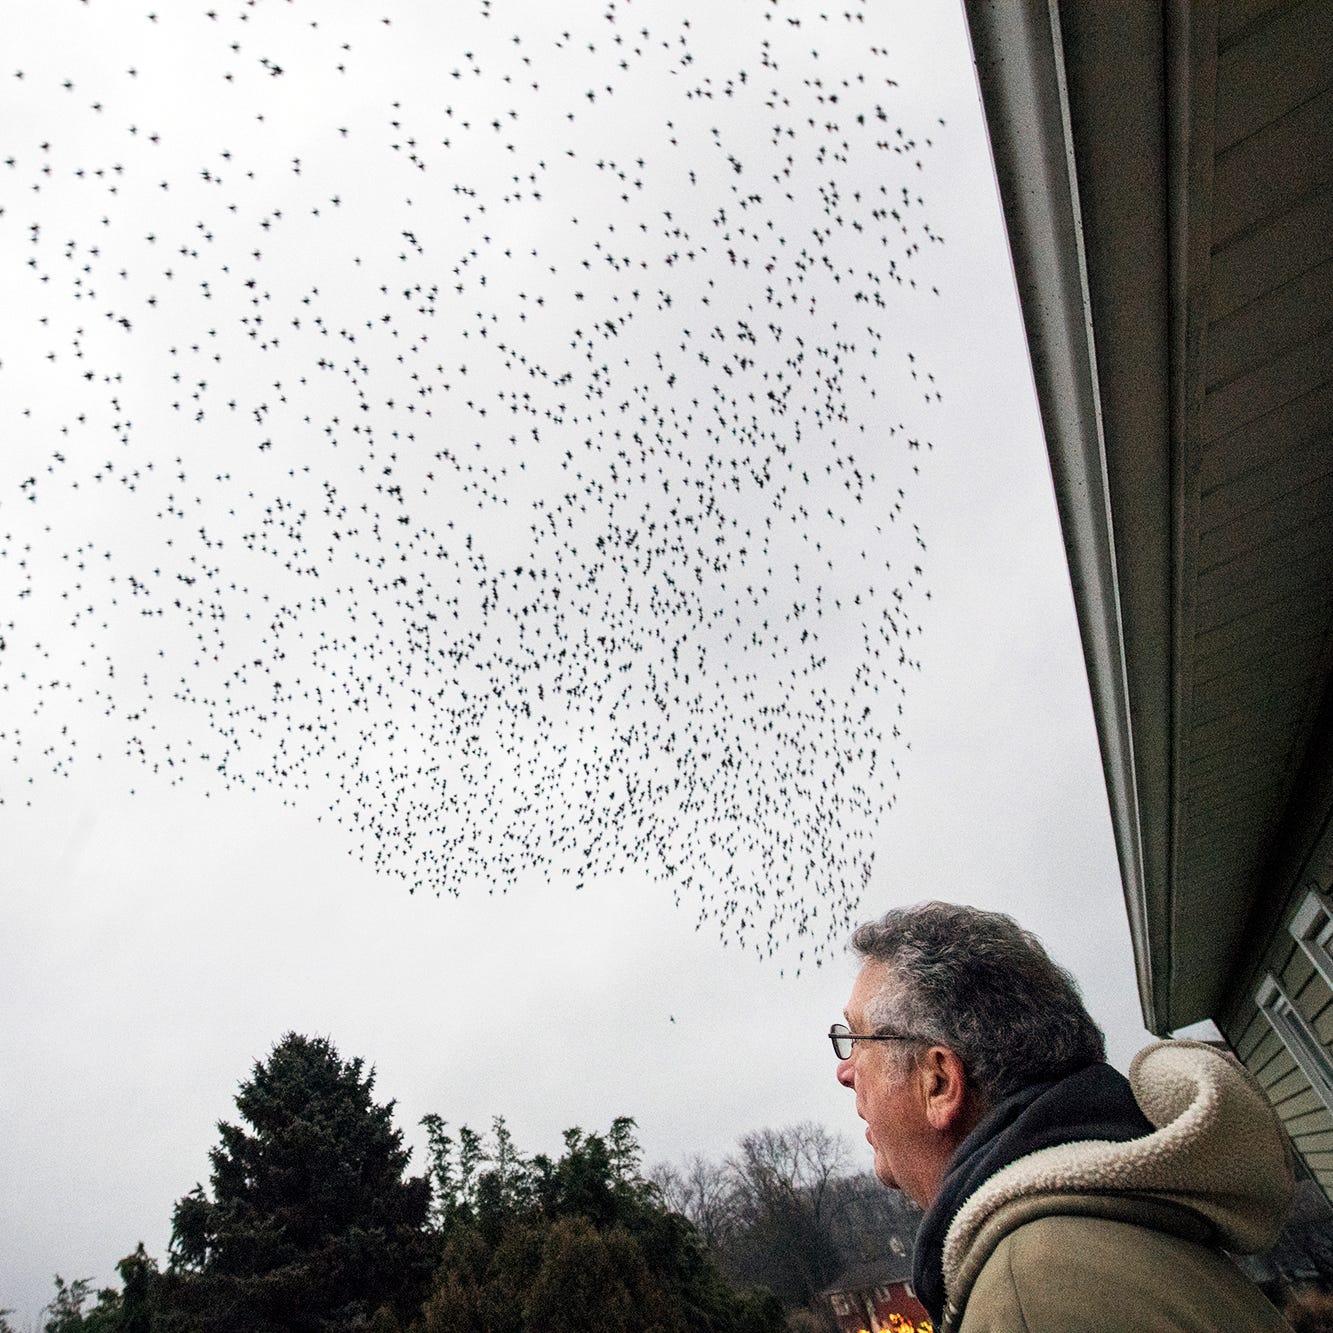 Birds swarming to bamboo grove turn York County neighborhood into Hitchcock movie